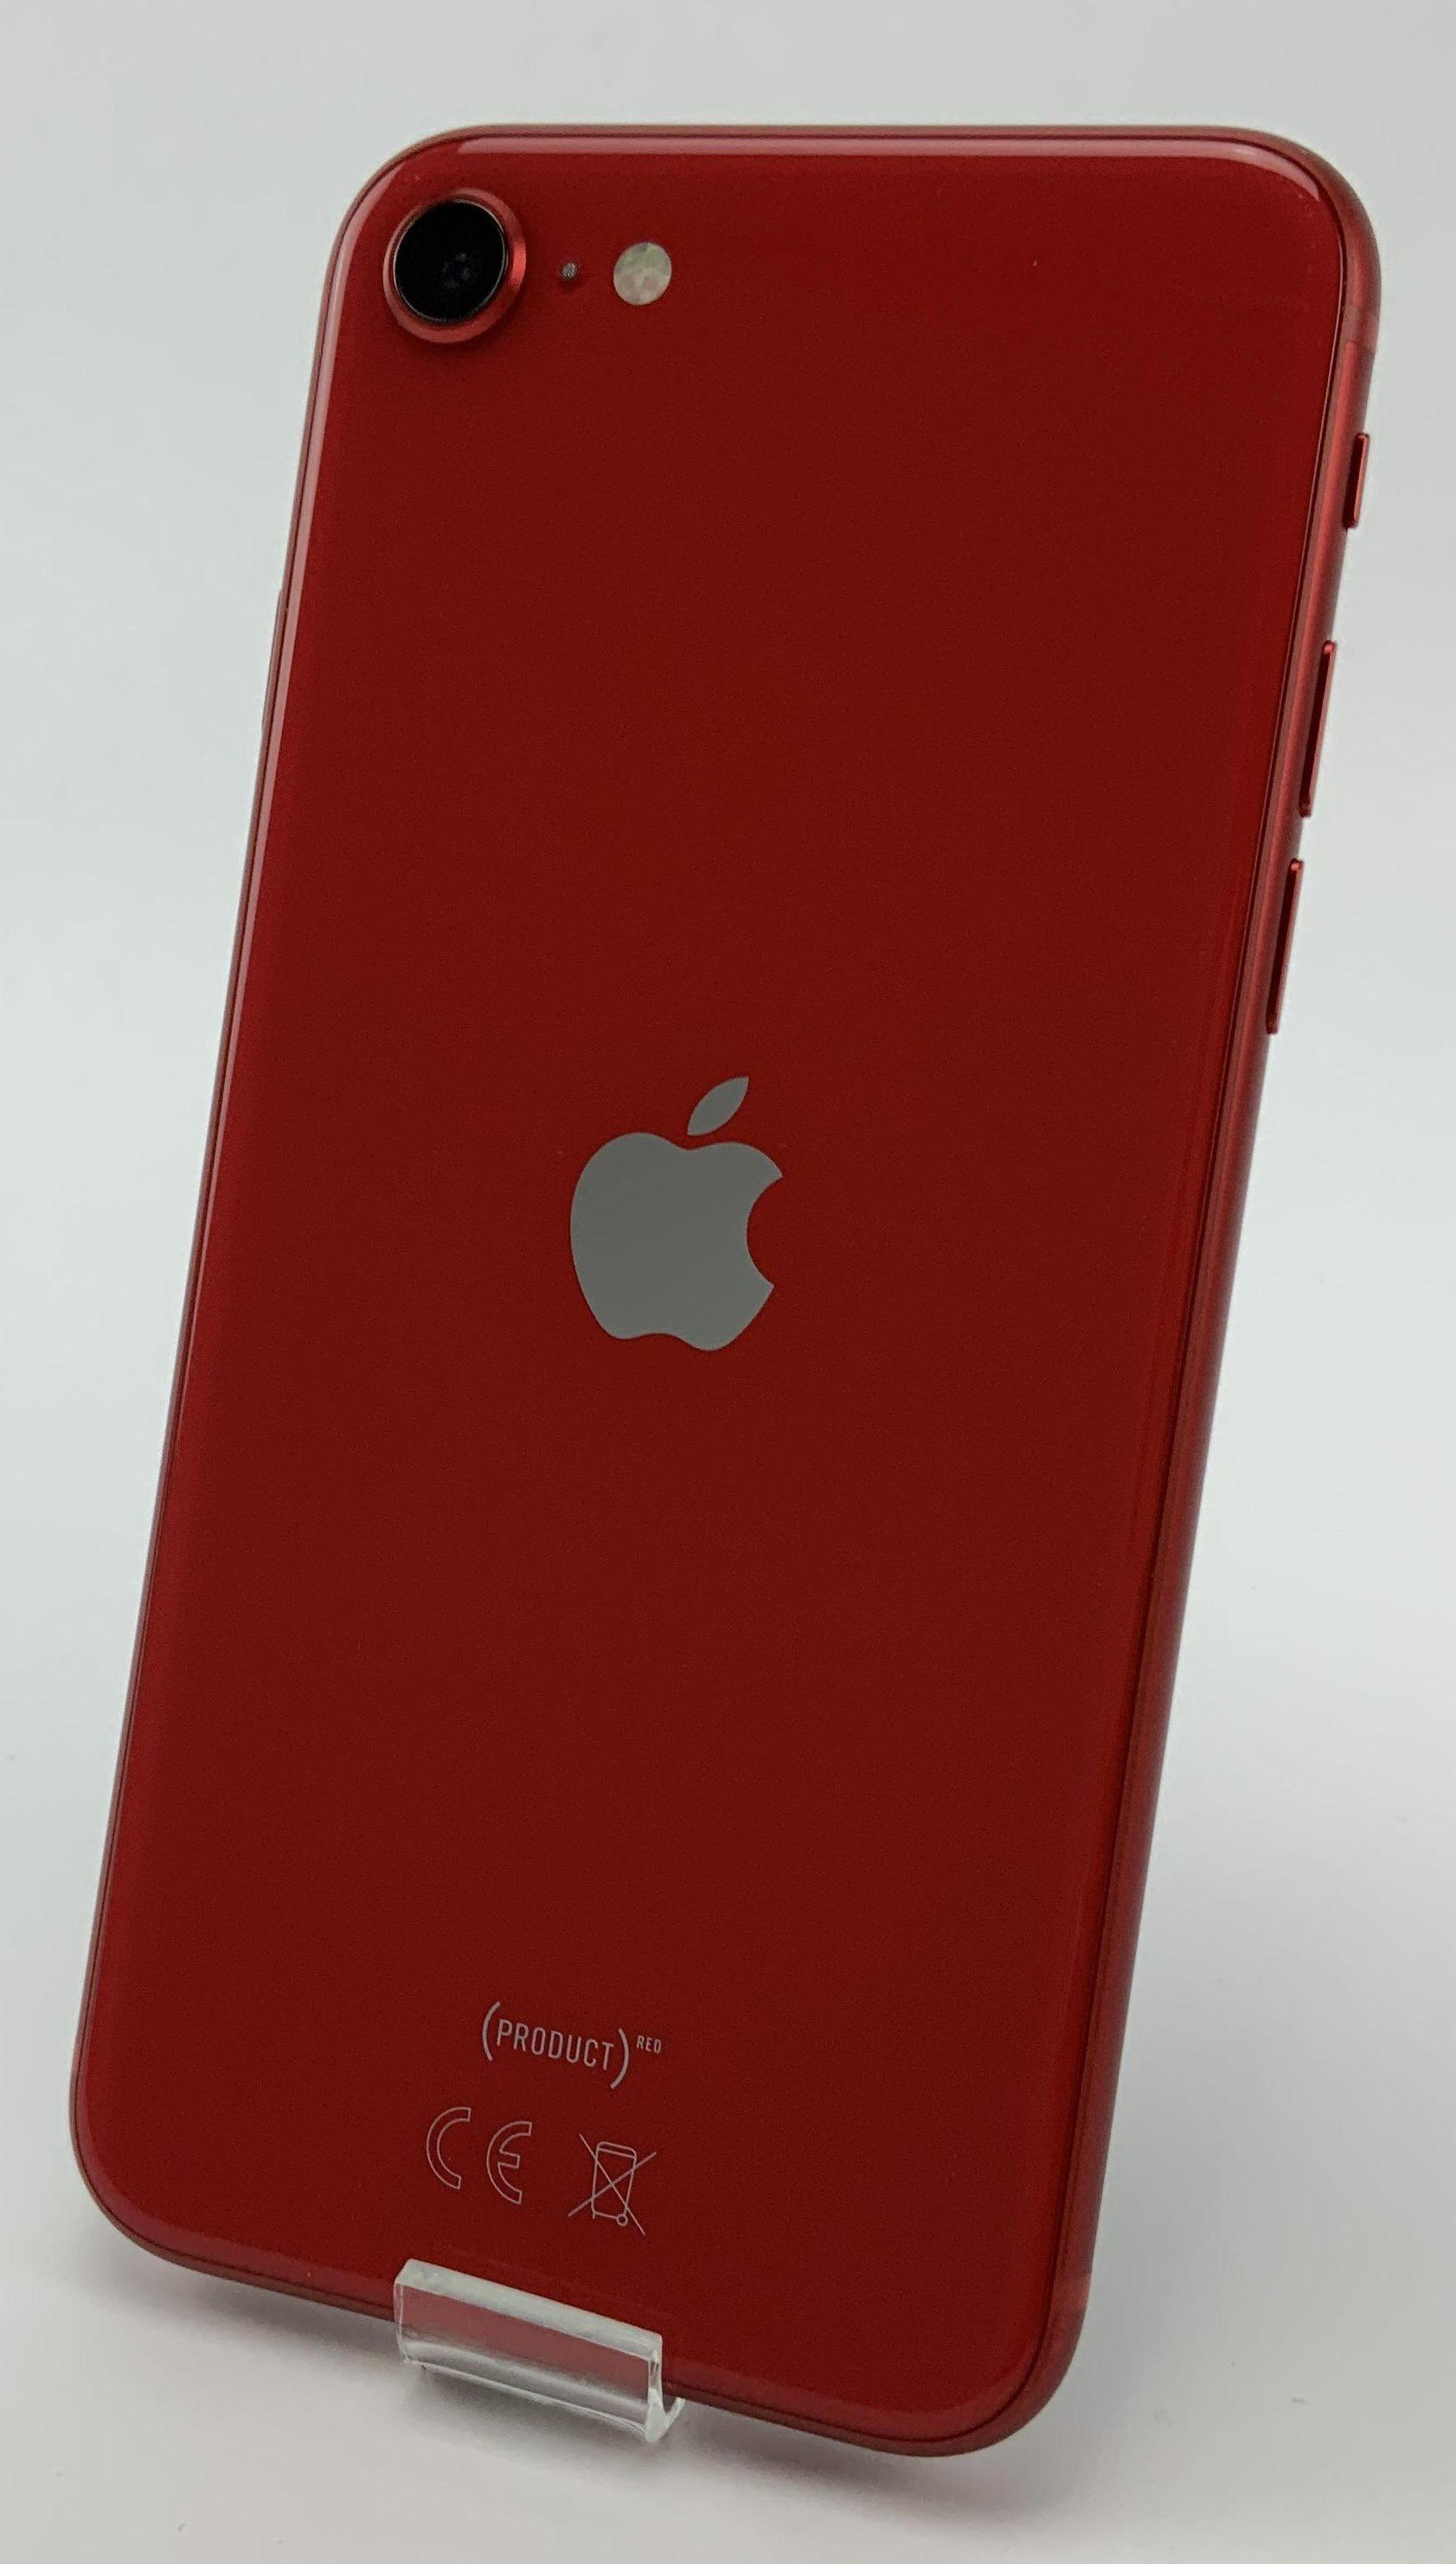 iPhone SE (2nd Gen) 64GB, 64GB, Red, Kuva 2